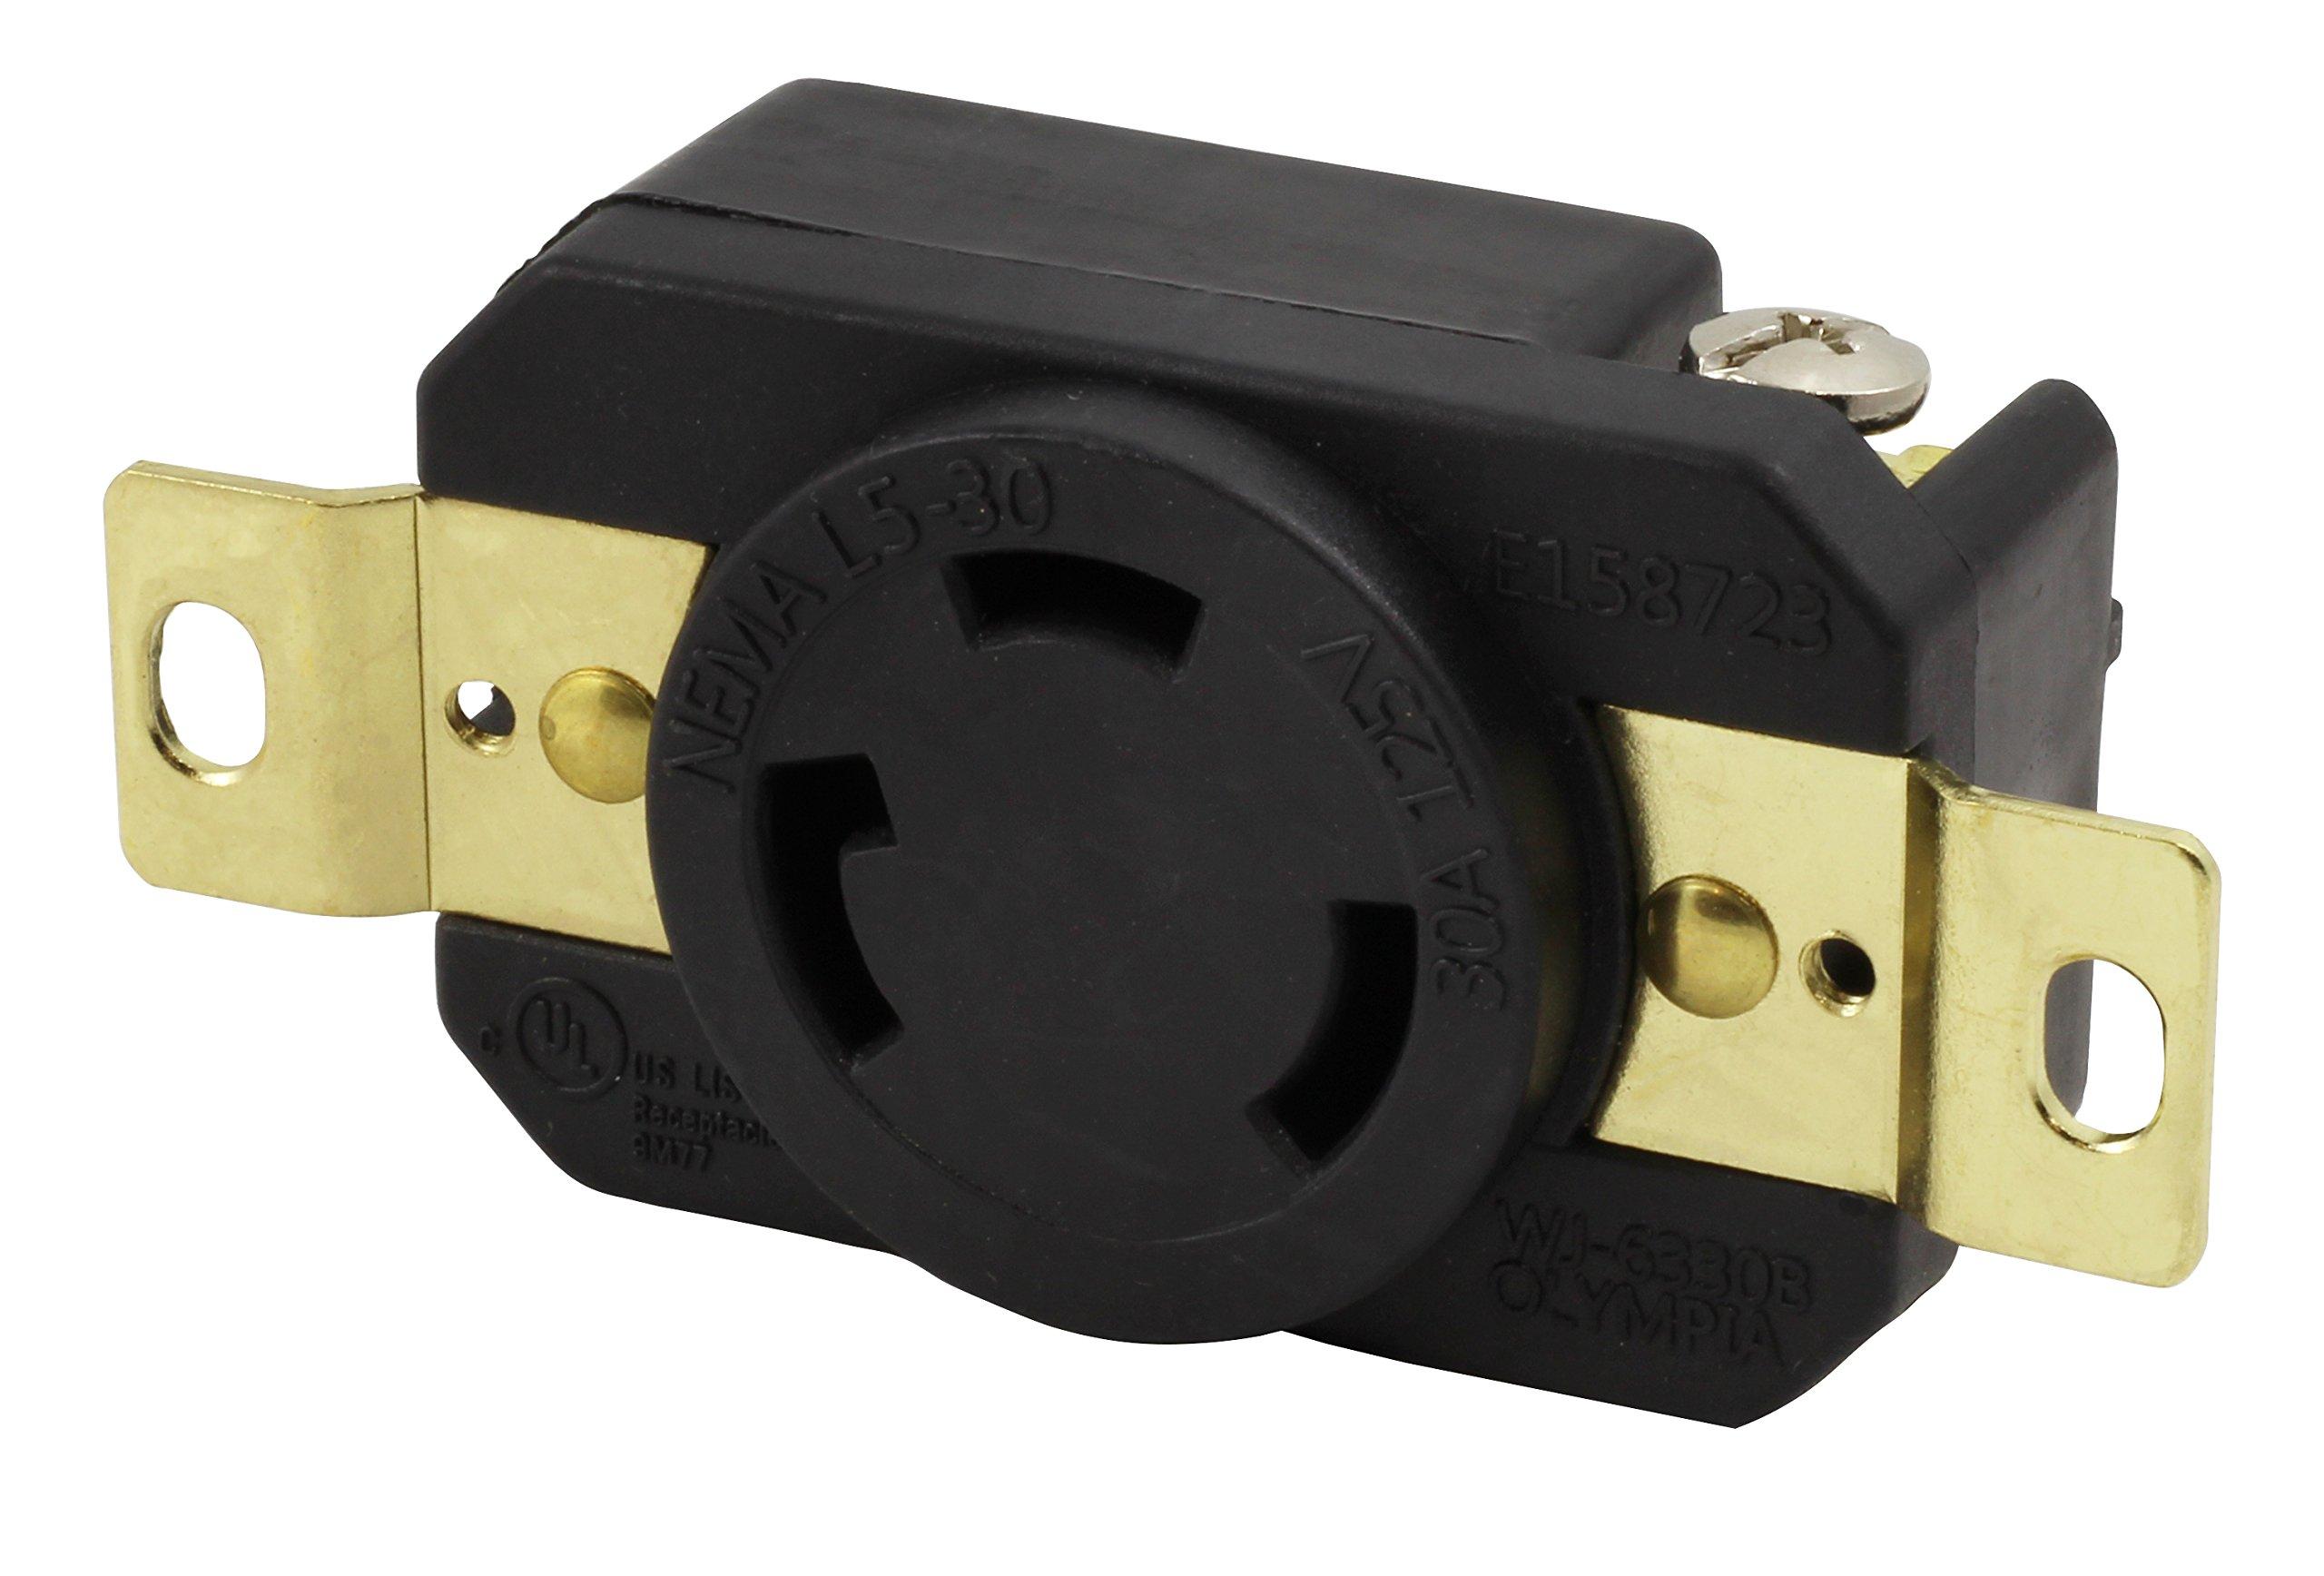 AC WORKS [FML530R] 30-Amp, 125-Volt, NEMA L5-30R Flush Mounting Locking Industrial Grade Receptacle